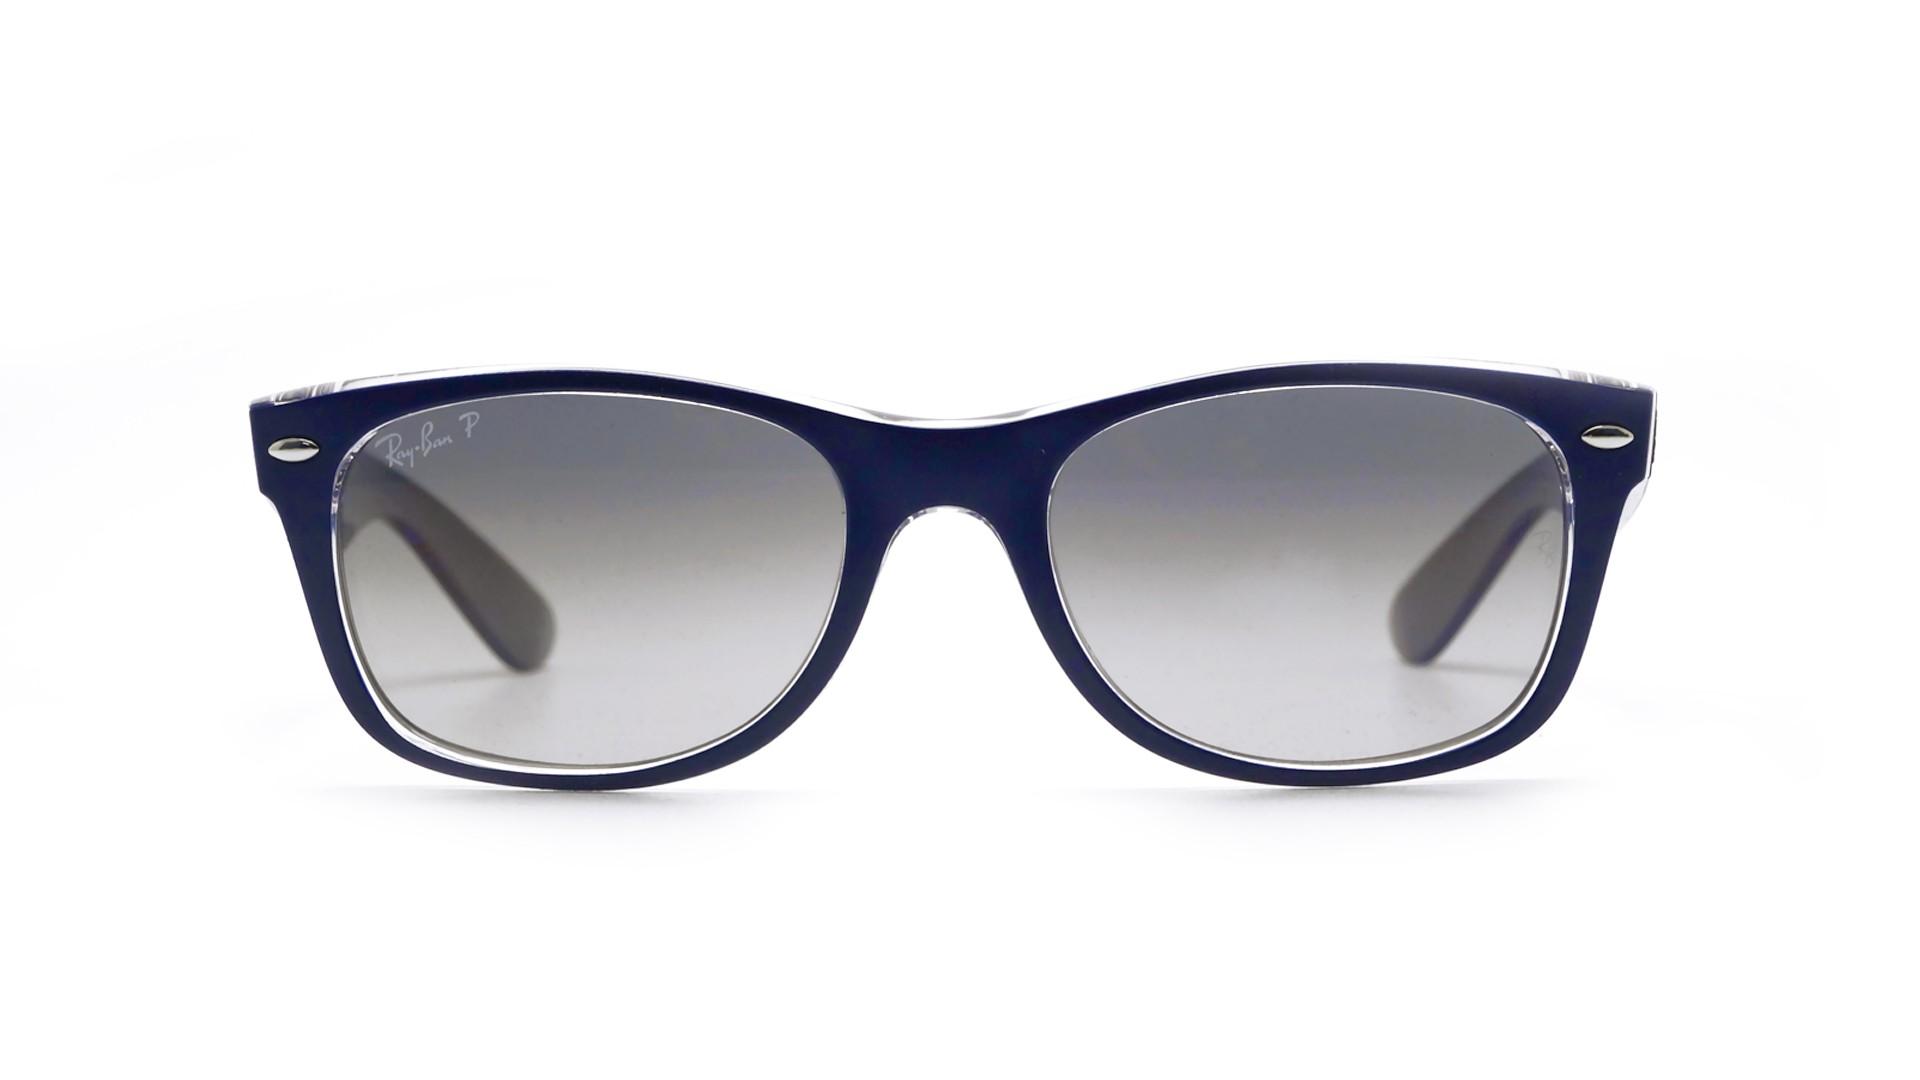 1b9789992f55 Ray Ban New Wayfarer Polarized Blue